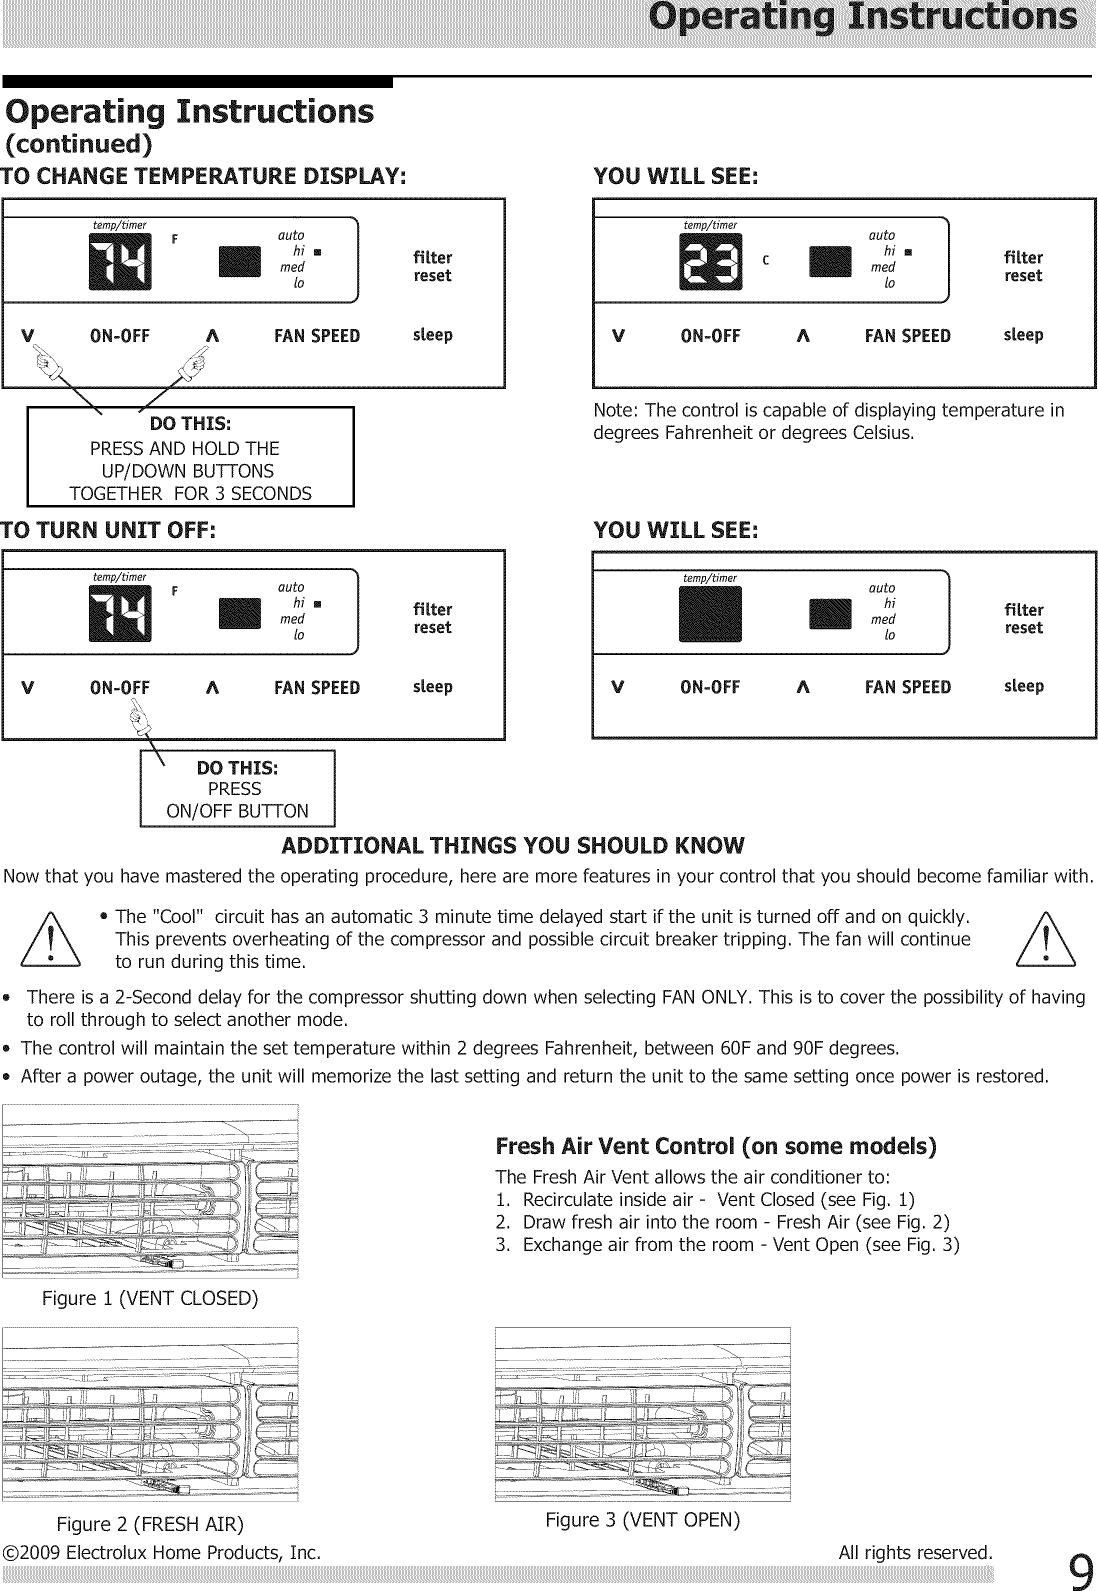 Frigidaire LRA087AT715 User Manual ROOM AIR CONDITIONER